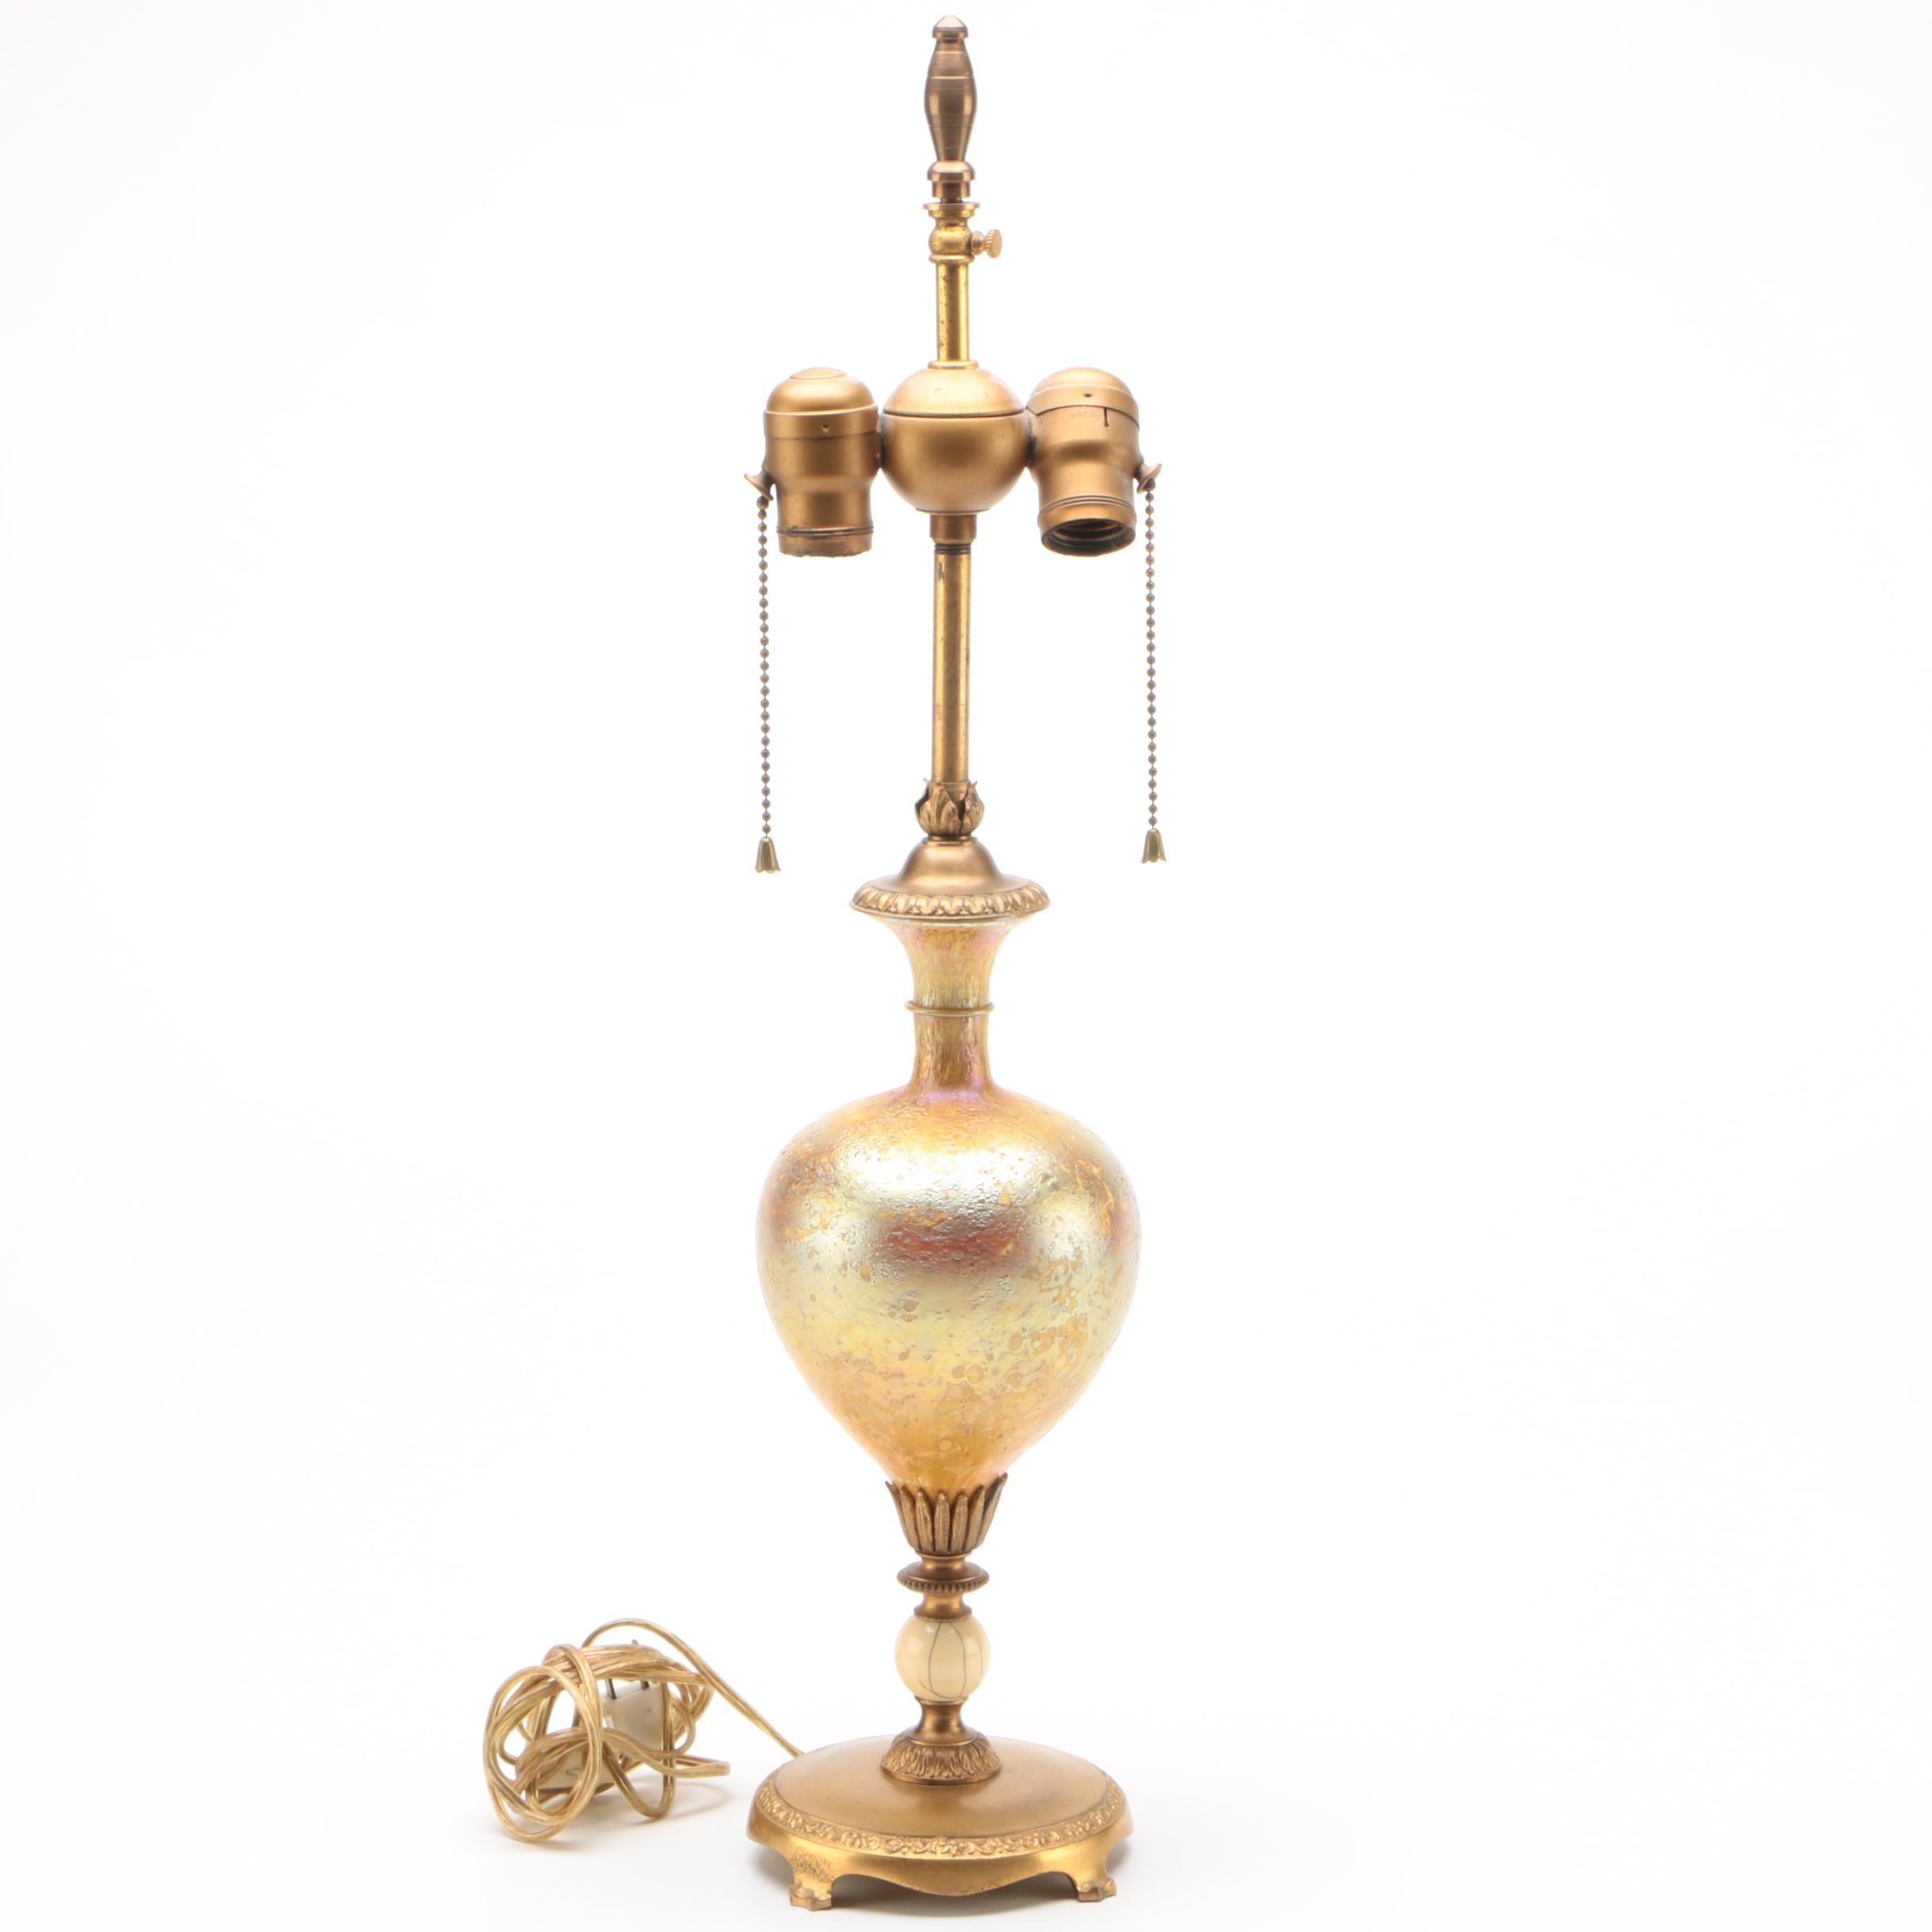 Louis Comfort Tiffany Gold Aurene Favrile Art Glass Table Lamp